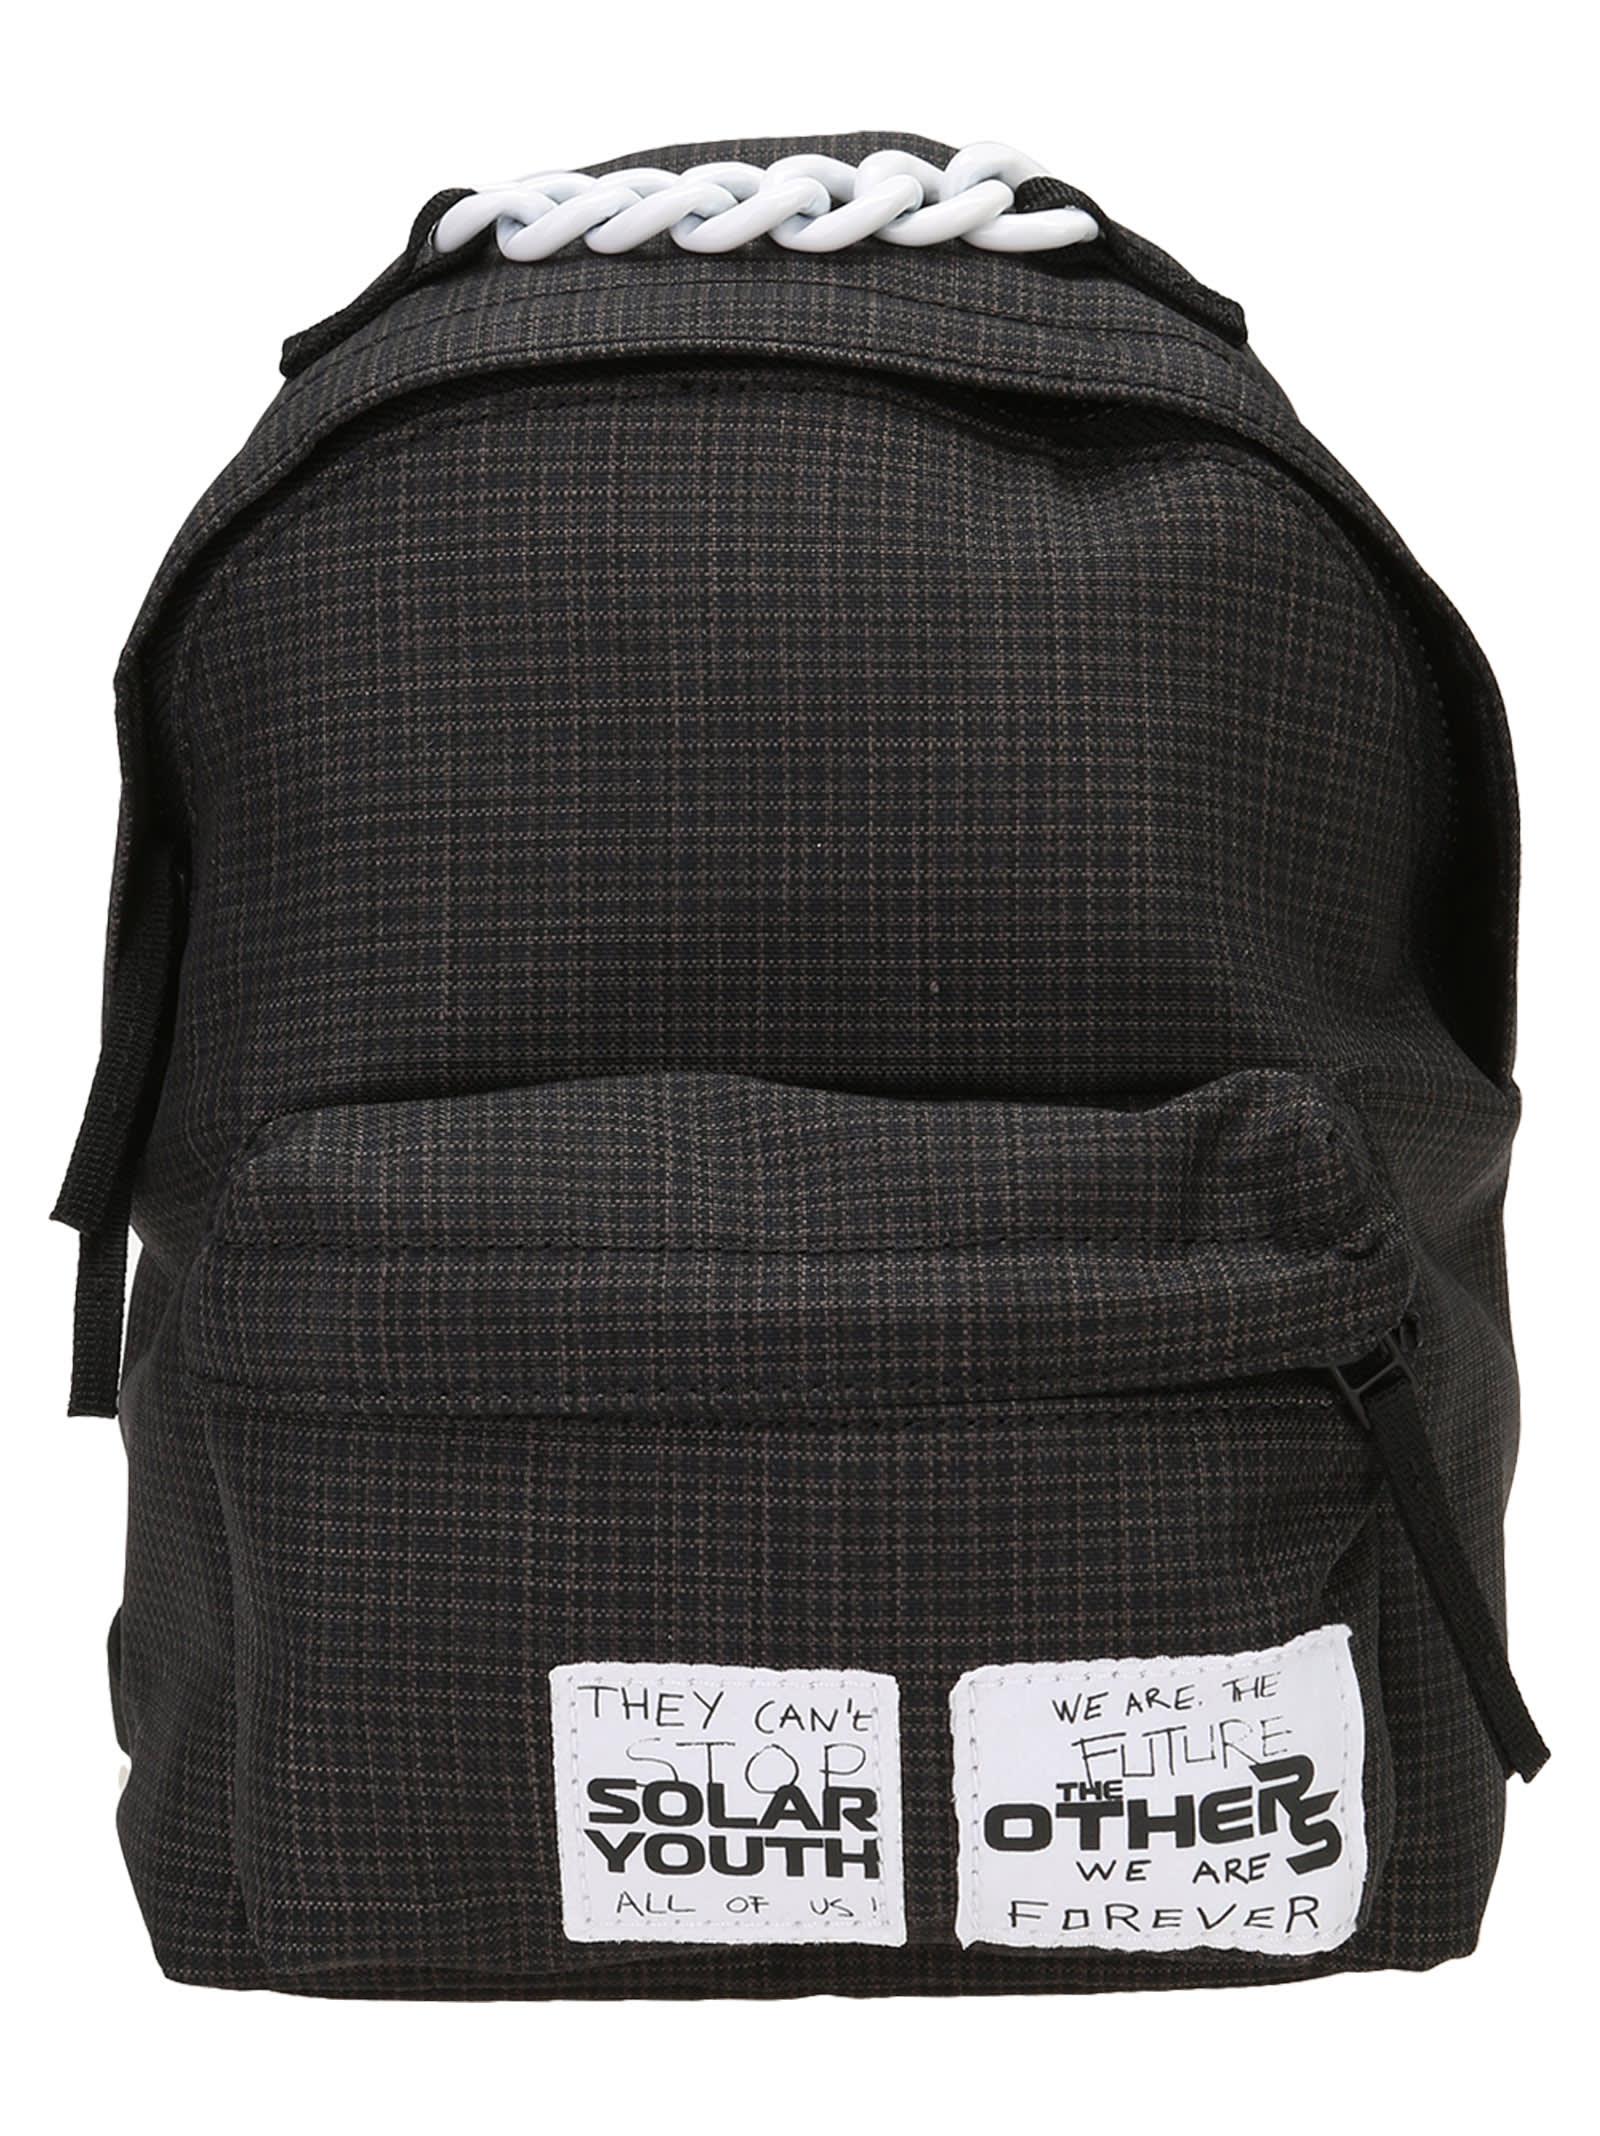 Eastpak By Raf Simons Raf Simons Pakr Xs Small Check Backpack